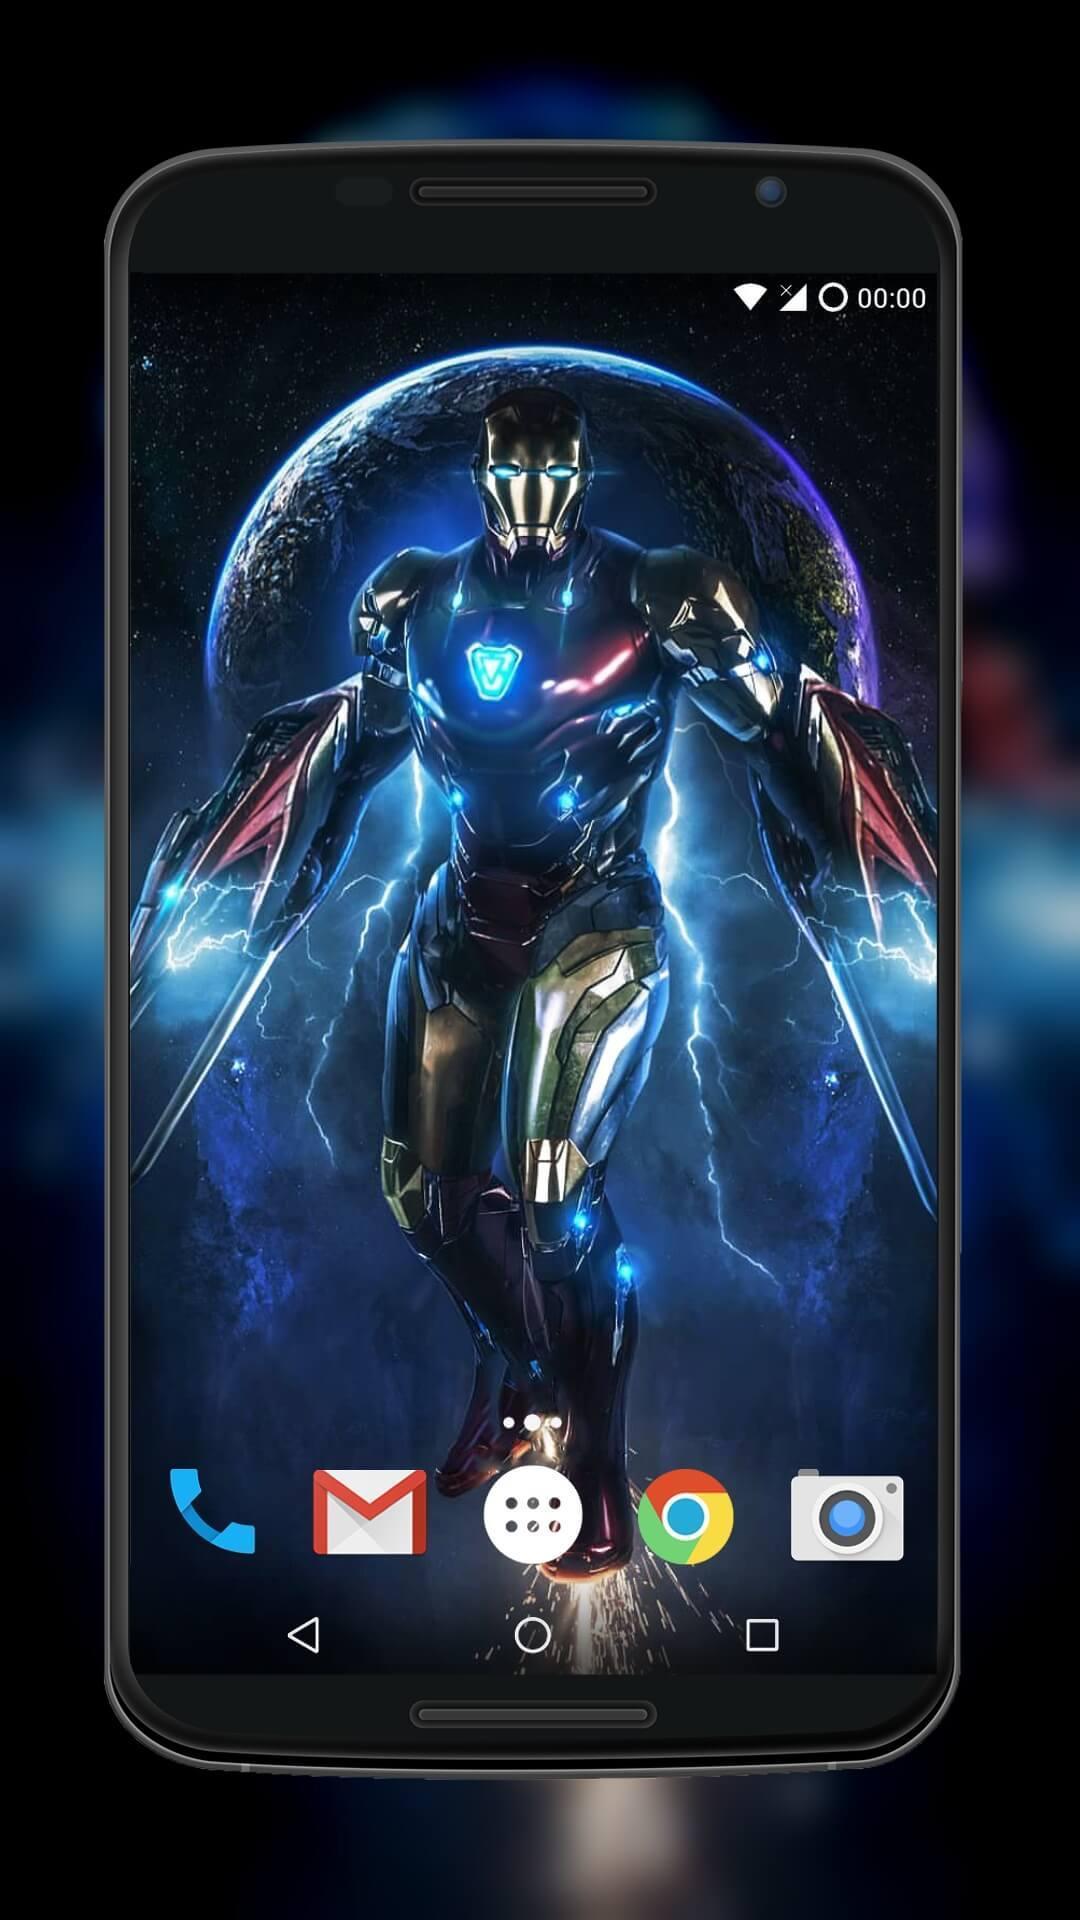 Avengers Endgame Wallpaper For Android Apk Download